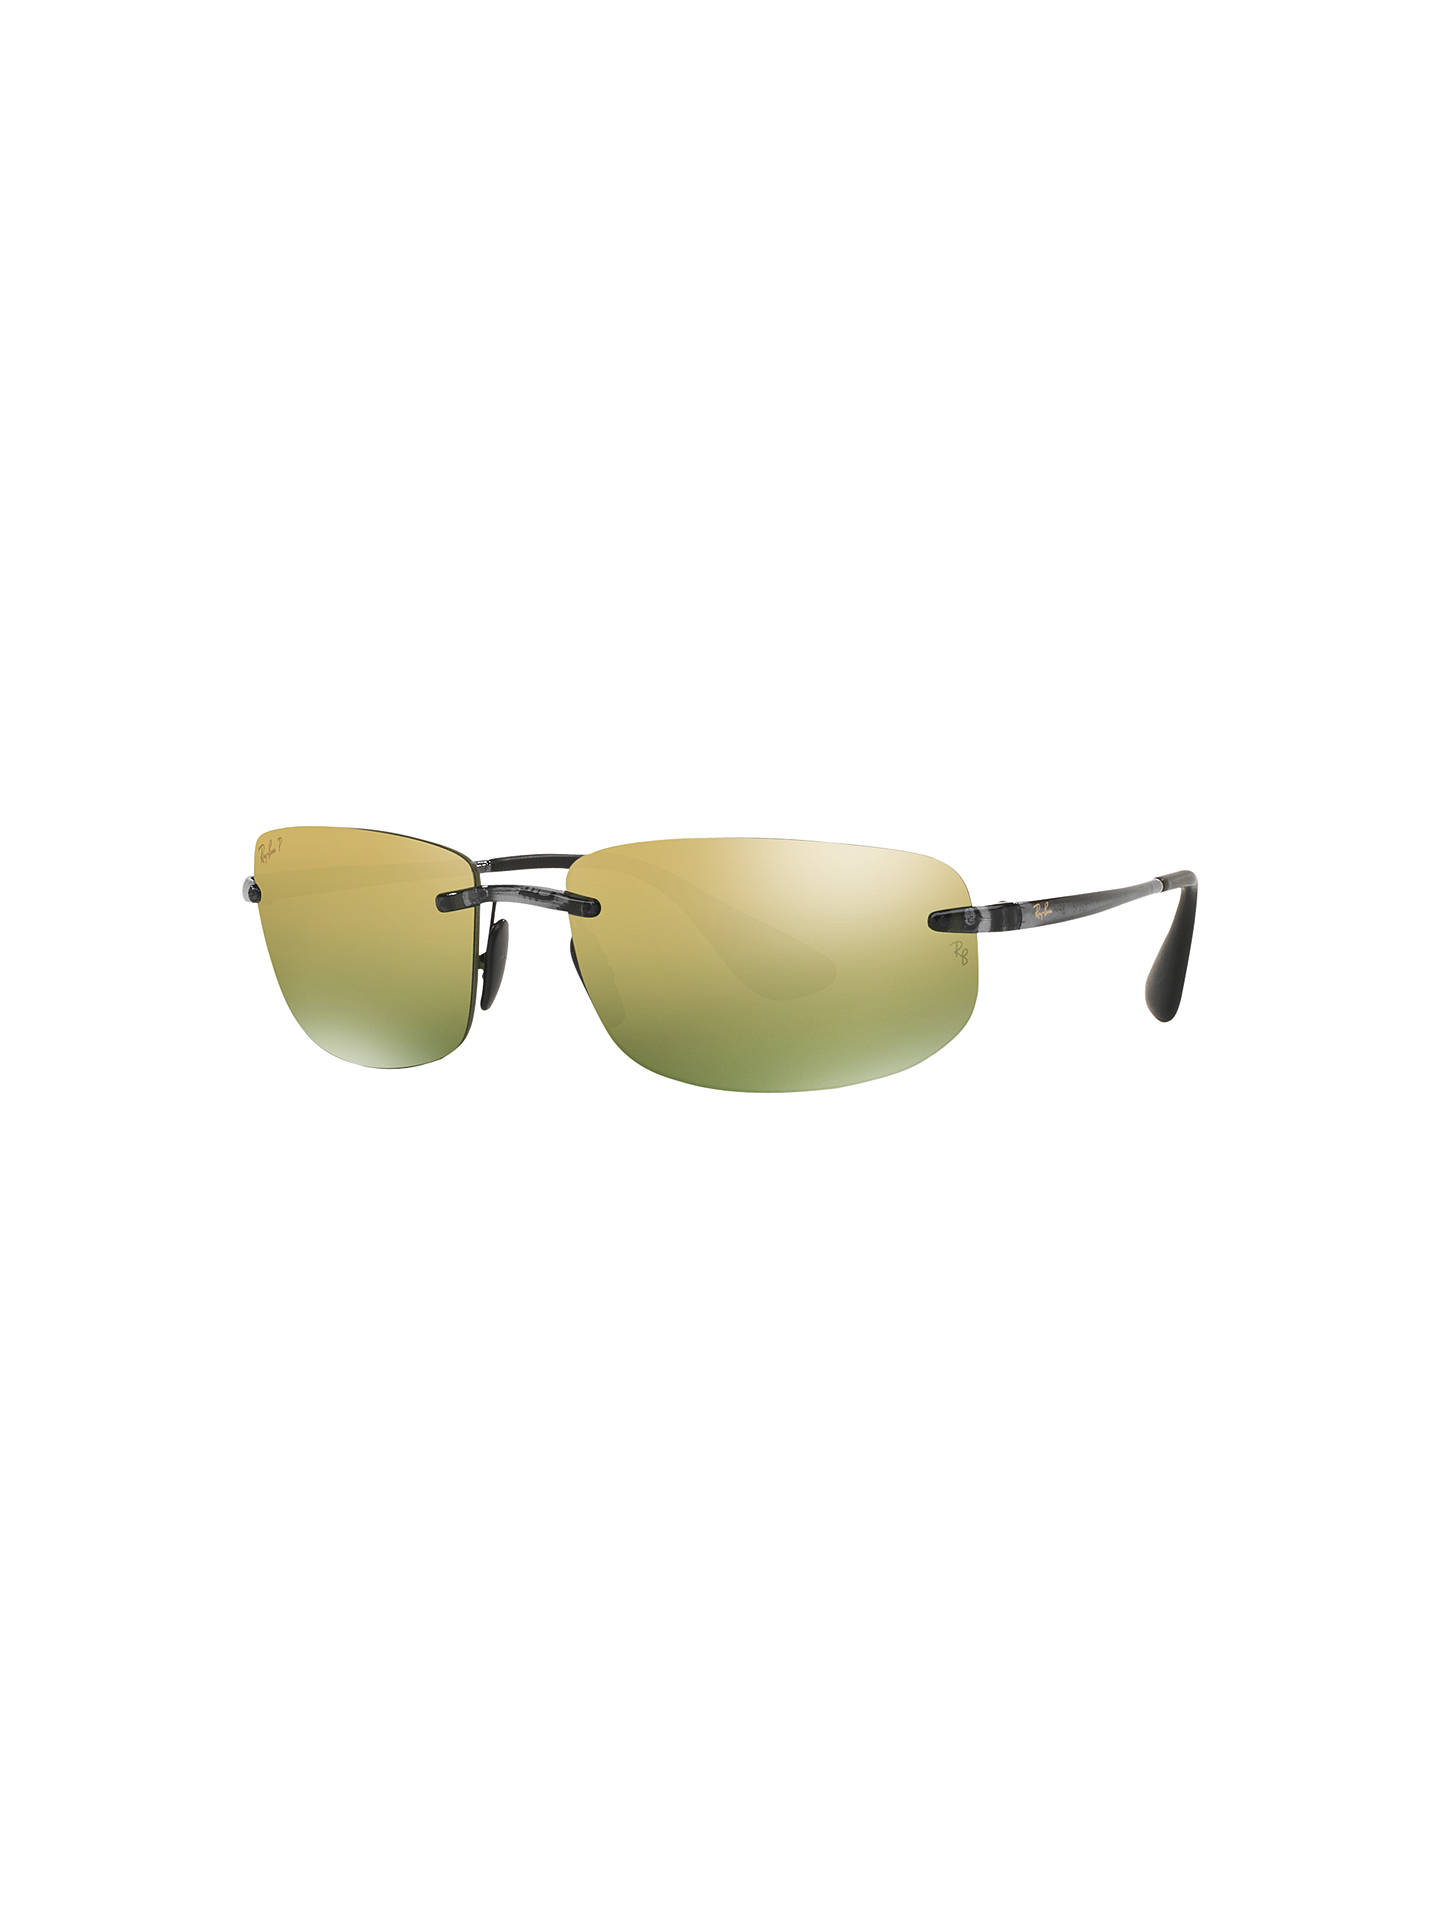 a7242558d0 Ray-Ban RB4254 Chromance Polarised Rectangular Sunglasses at John ...